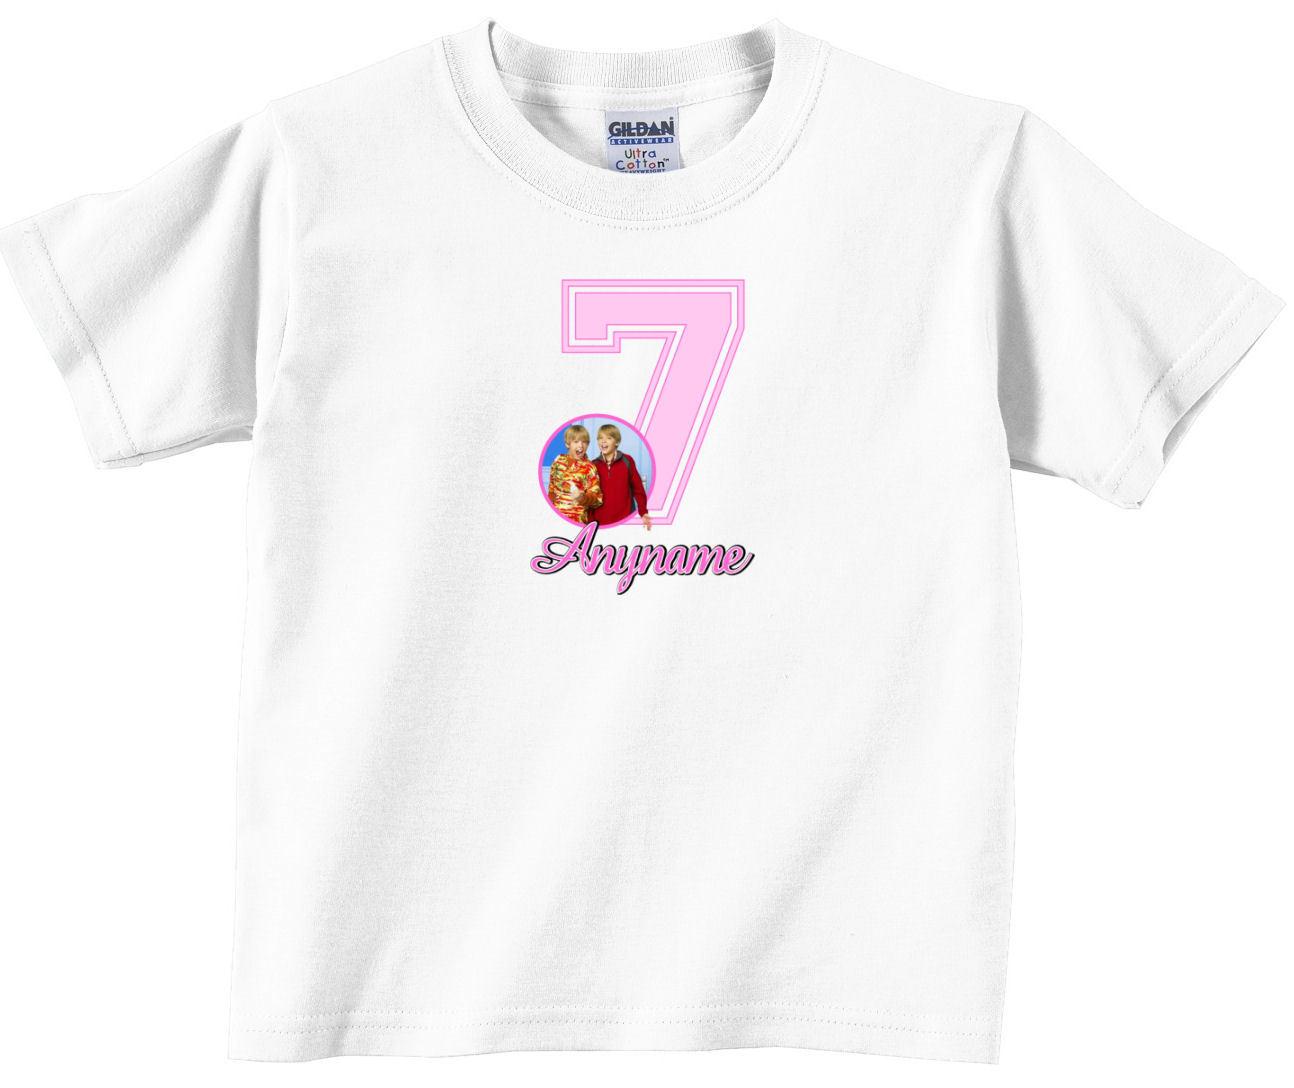 Zack & Cody Custom Personalized Birthday T-Shirt 02